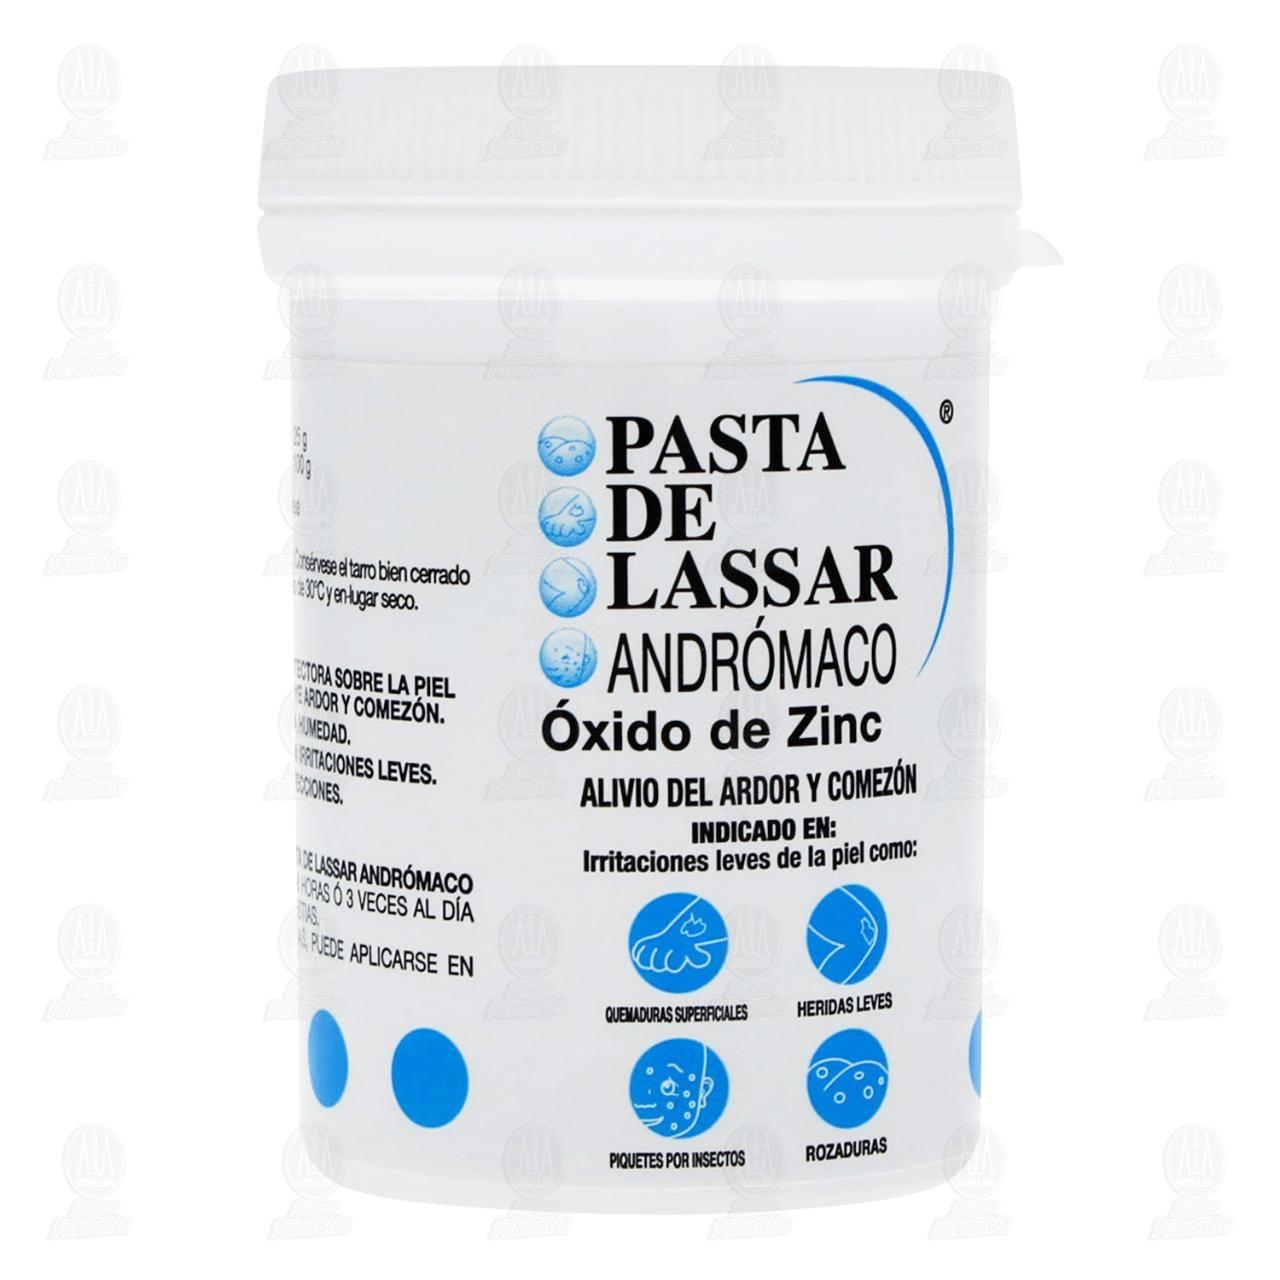 Comprar Pasta de Lassar 125gr Tarro en Farmacias Guadalajara